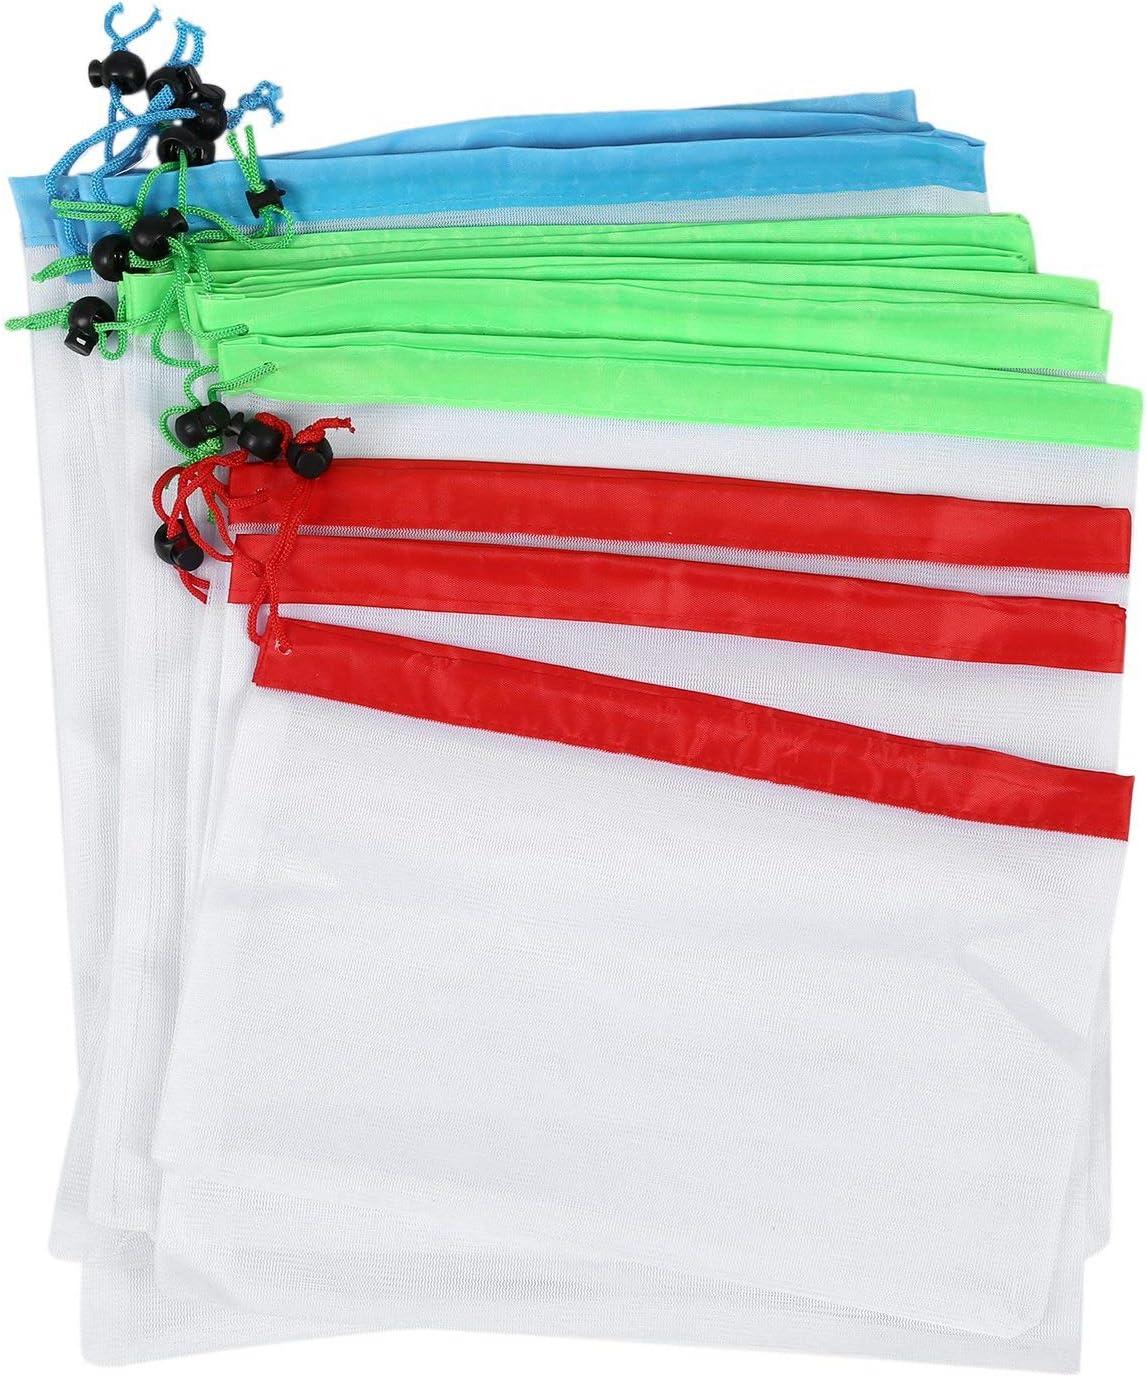 OVBBESS unisex 12pcs Reusable Mesh Produce Washable B Eco Friendly Limited price Bags